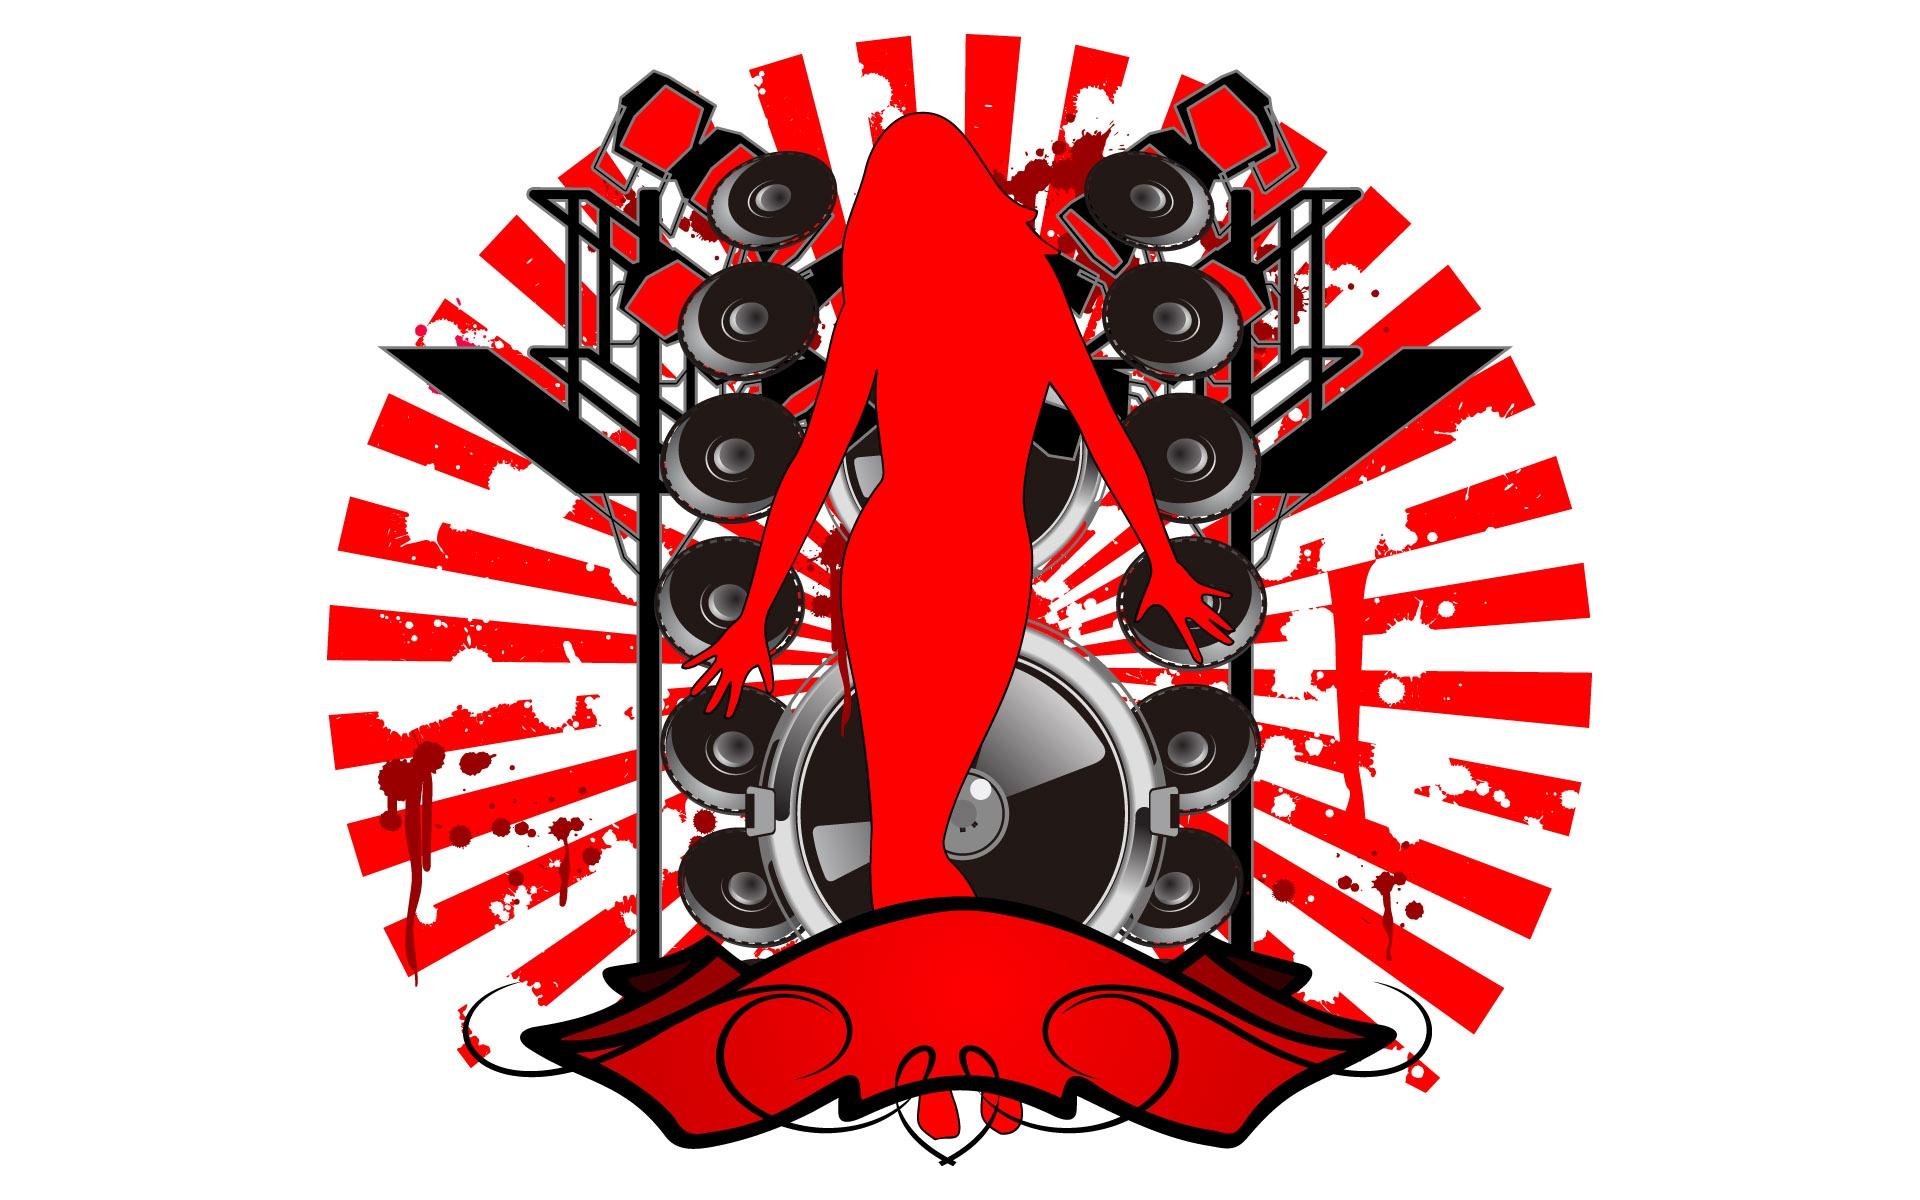 http://4.bp.blogspot.com/-jPK9Ws_VDVE/UEEXGKkVE_I/AAAAAAAAEZY/E4S0CqkTdnU/s1920/cool-vector-girl_1200.jpg